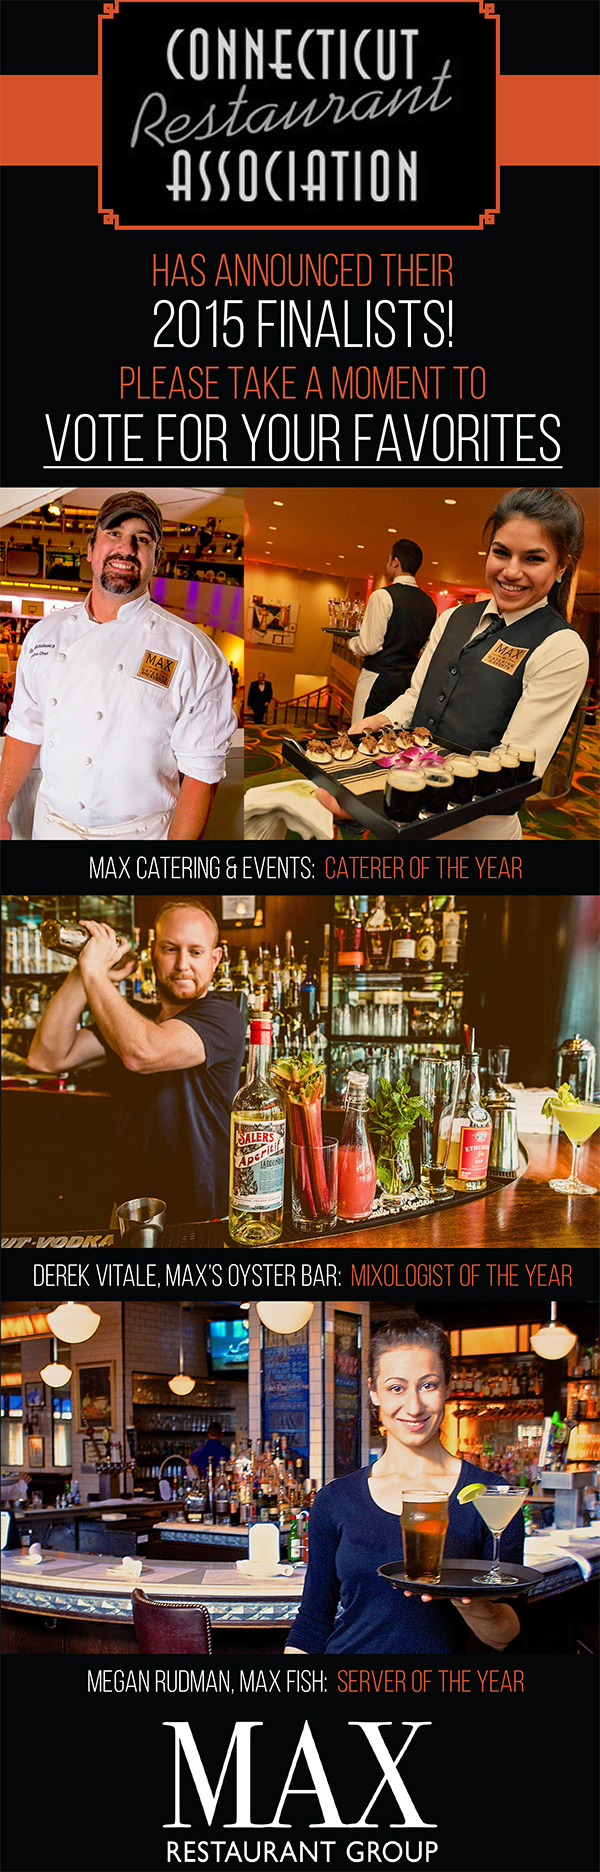 Max-CT-Restaurant-Assoc-NEW